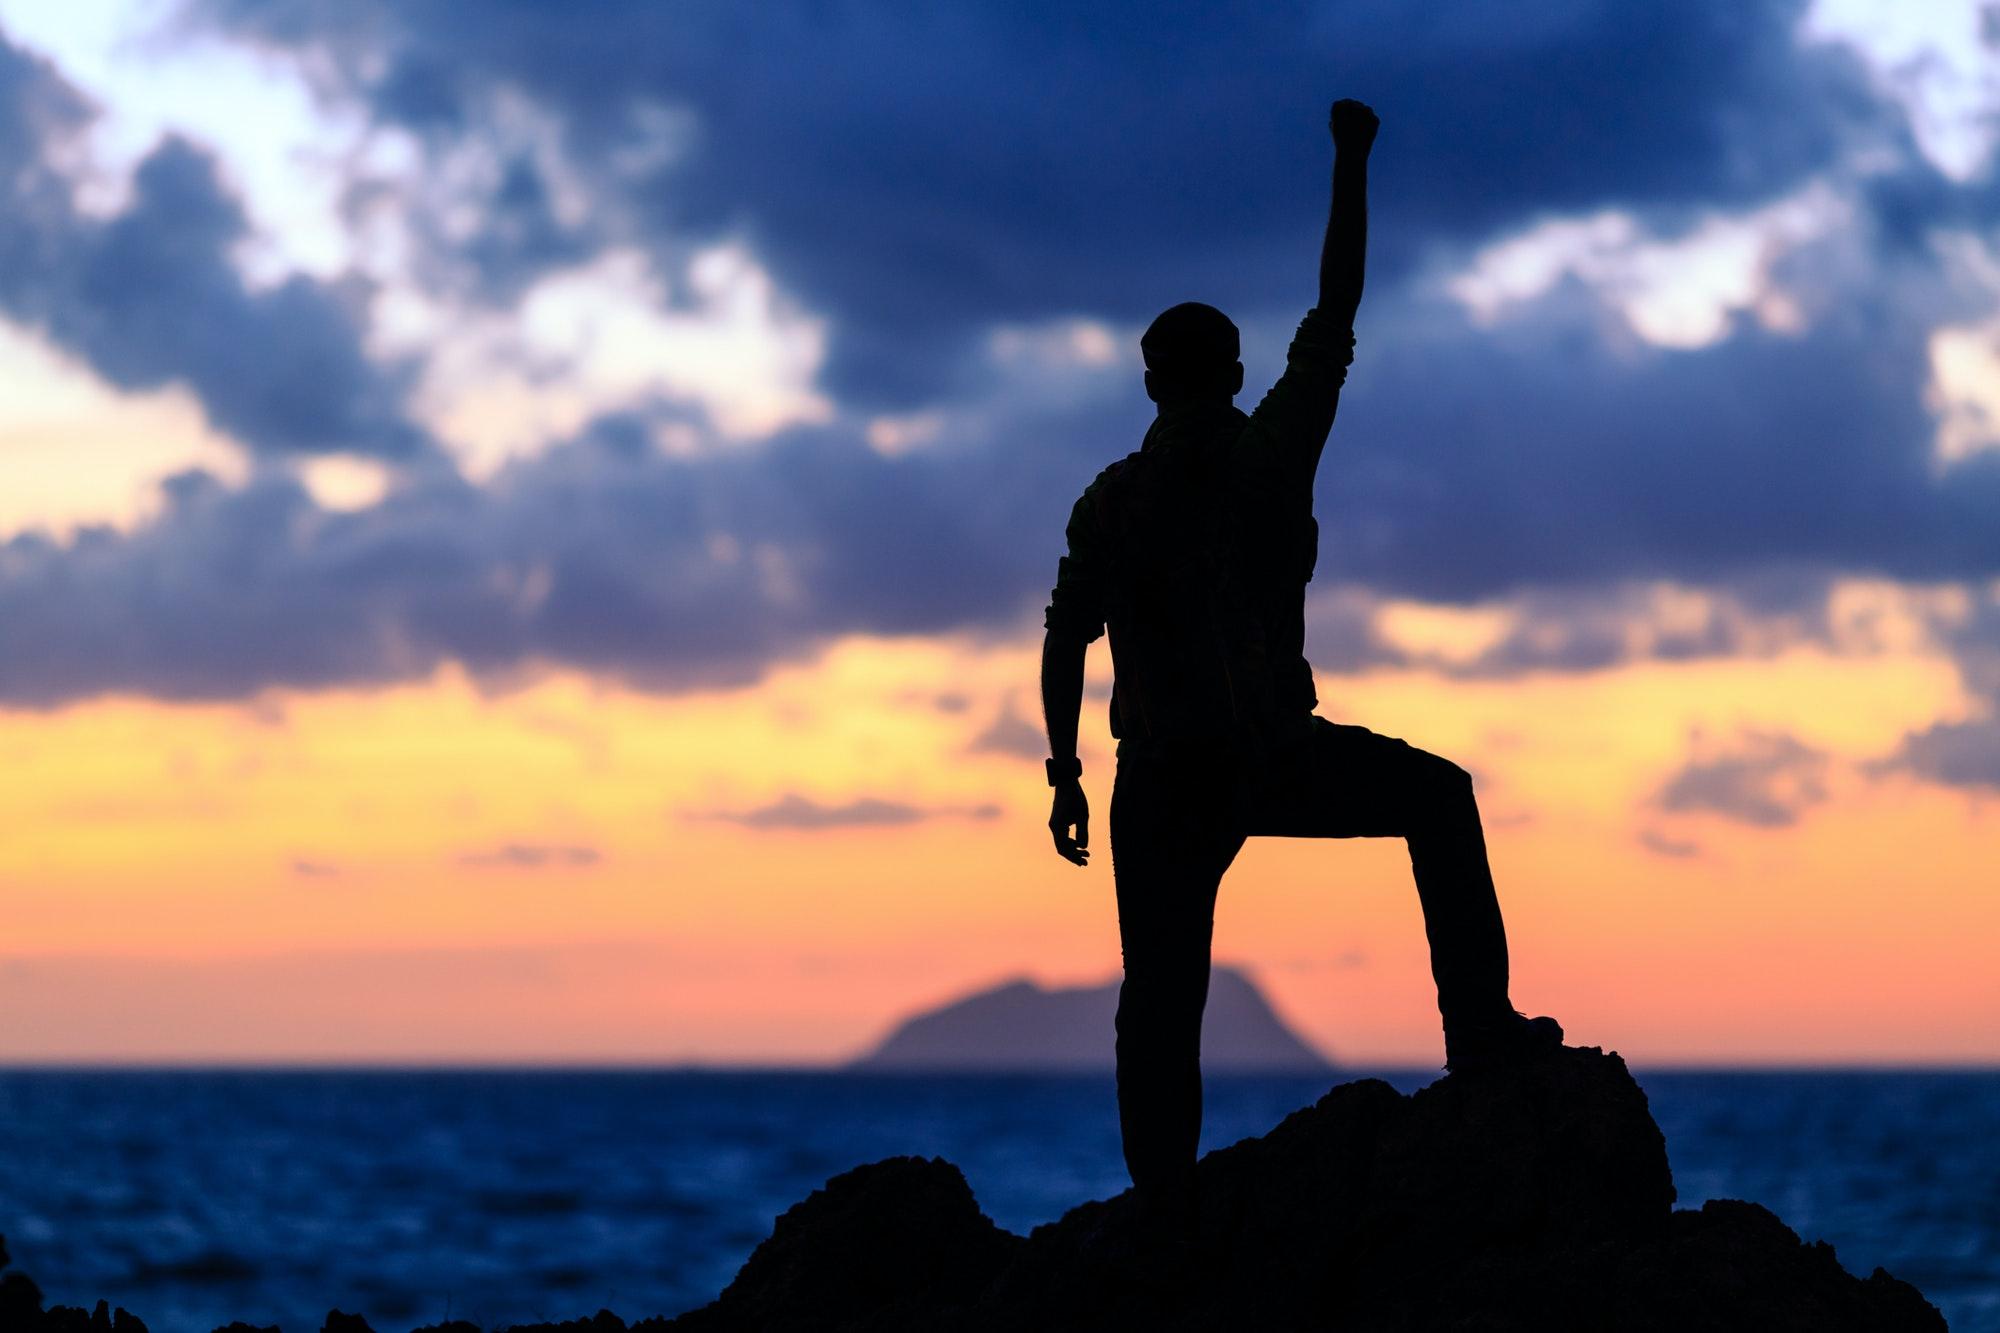 happy-success-winner-life-goal-achievement